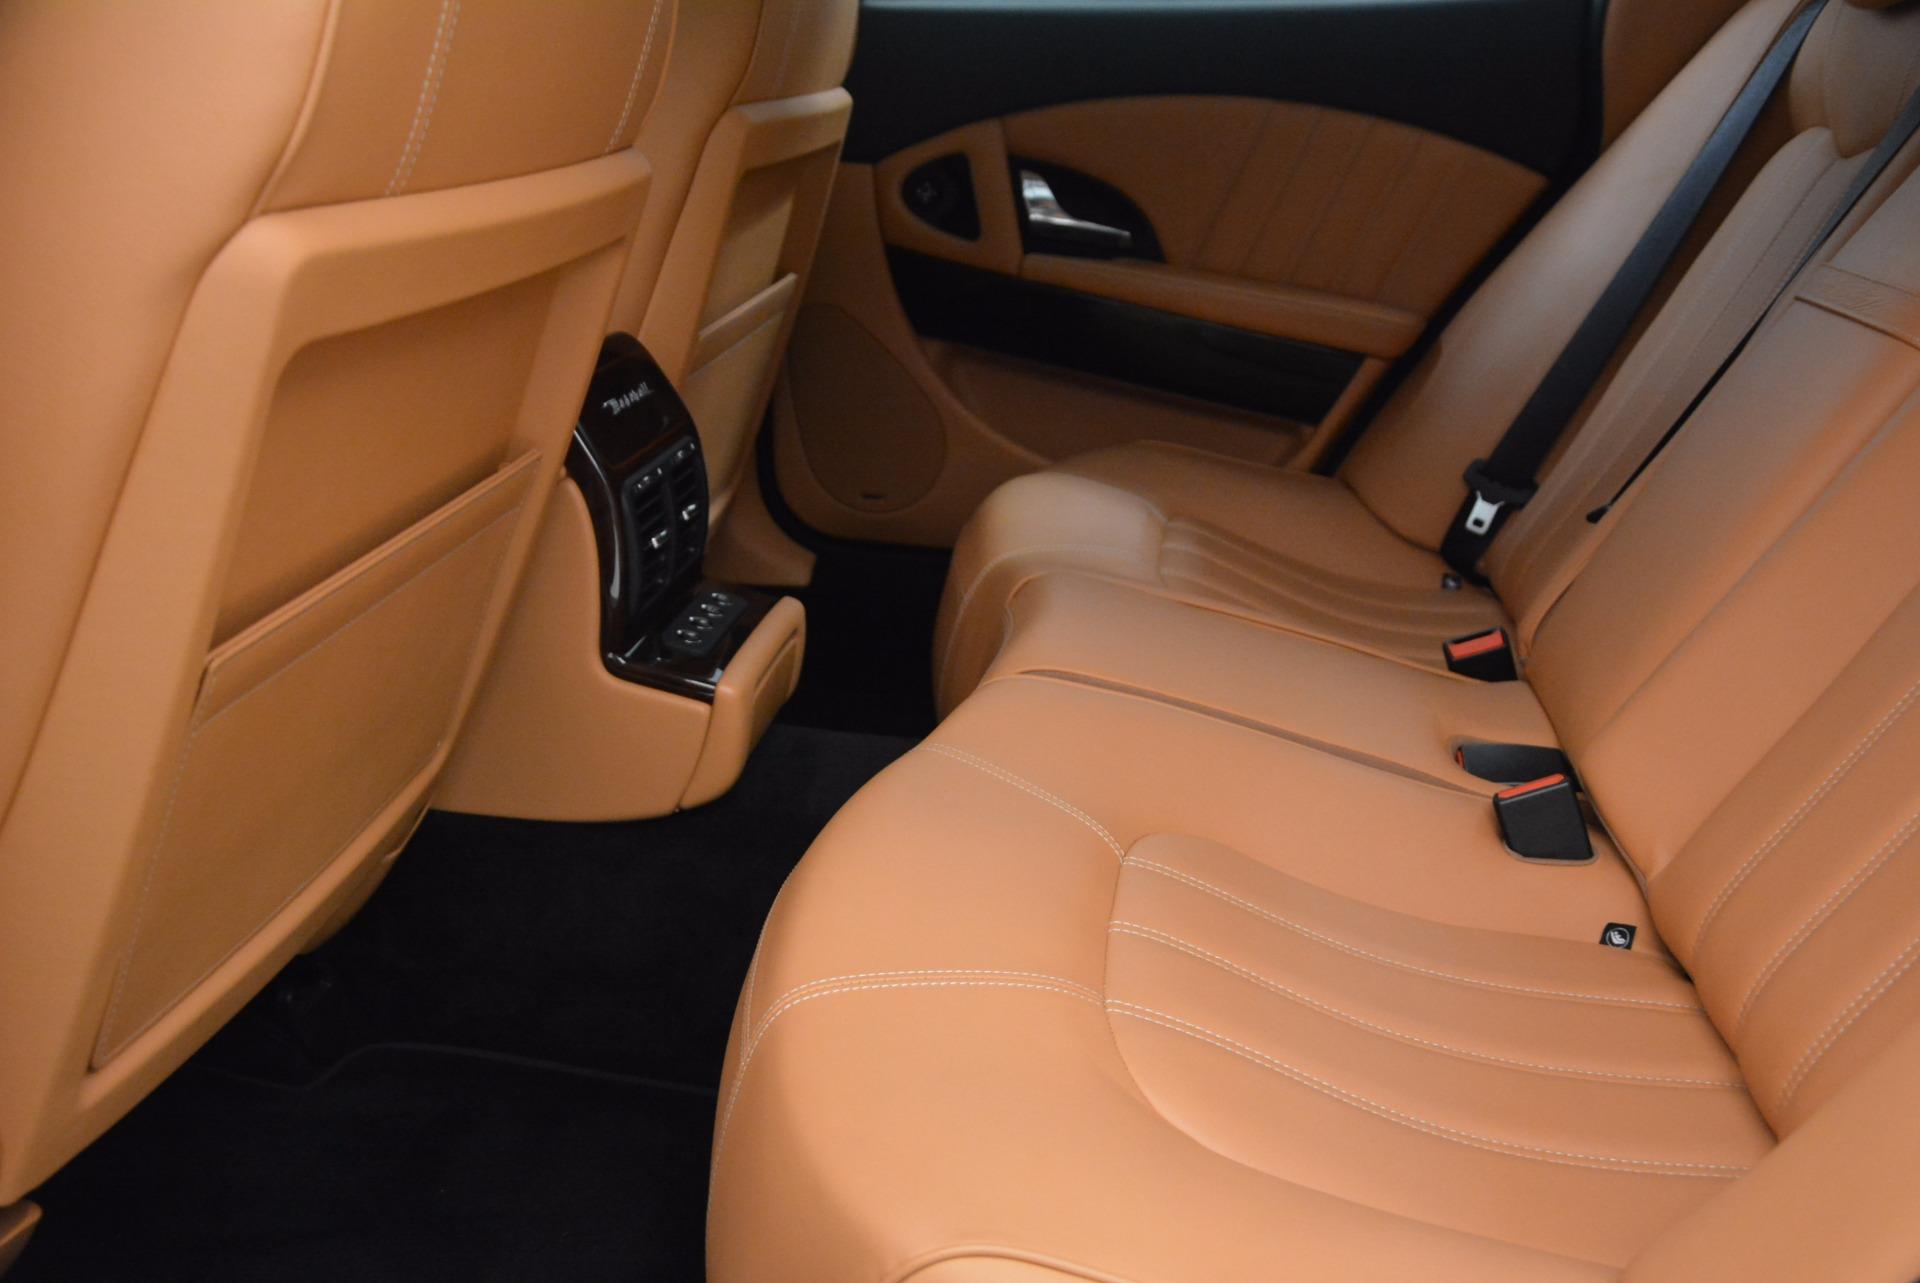 Used 2010 Maserati Quattroporte S For Sale In Westport, CT 1551_p30